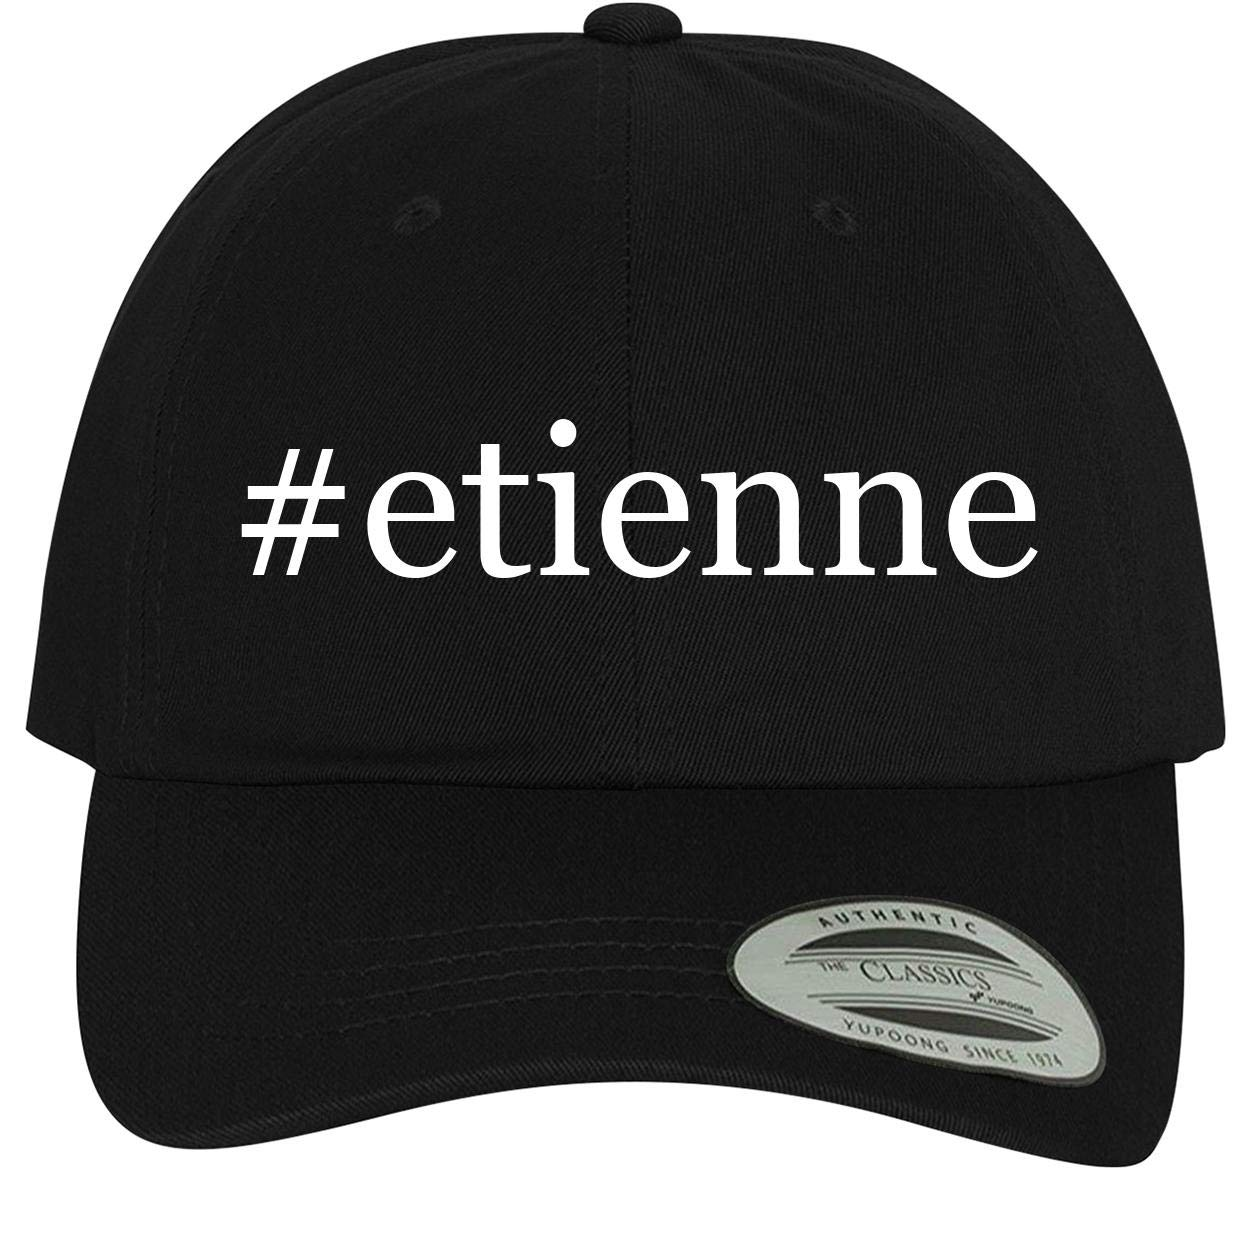 BH Cool Designs #Etienne Comfortable Dad Hat Baseball Cap